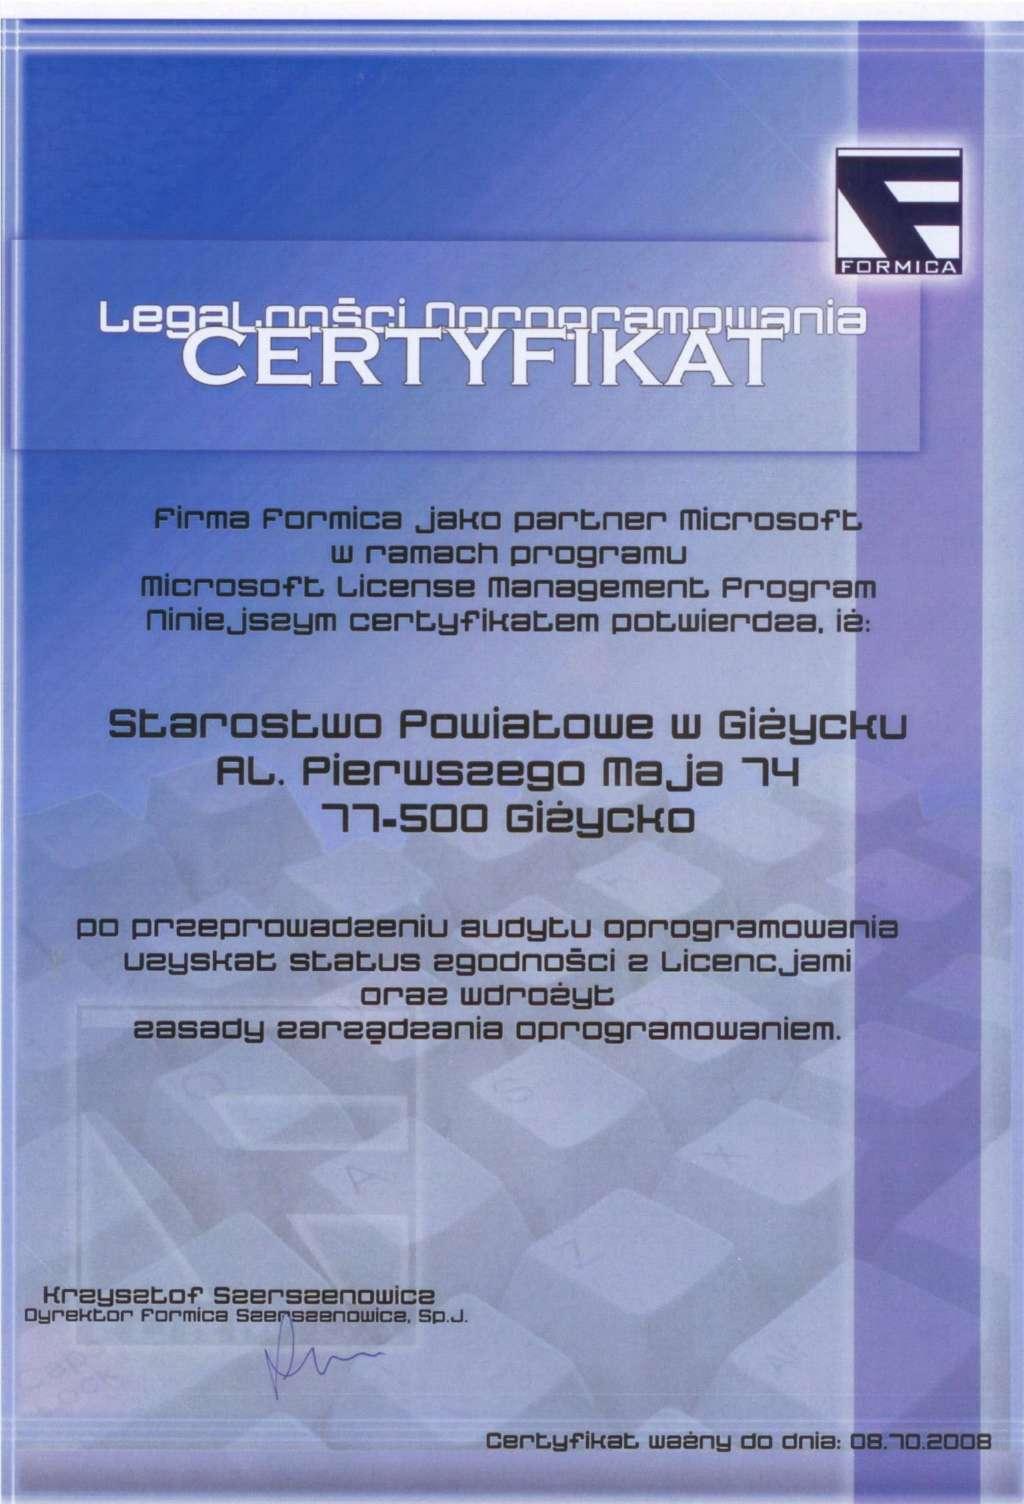 Certyfikat Formica